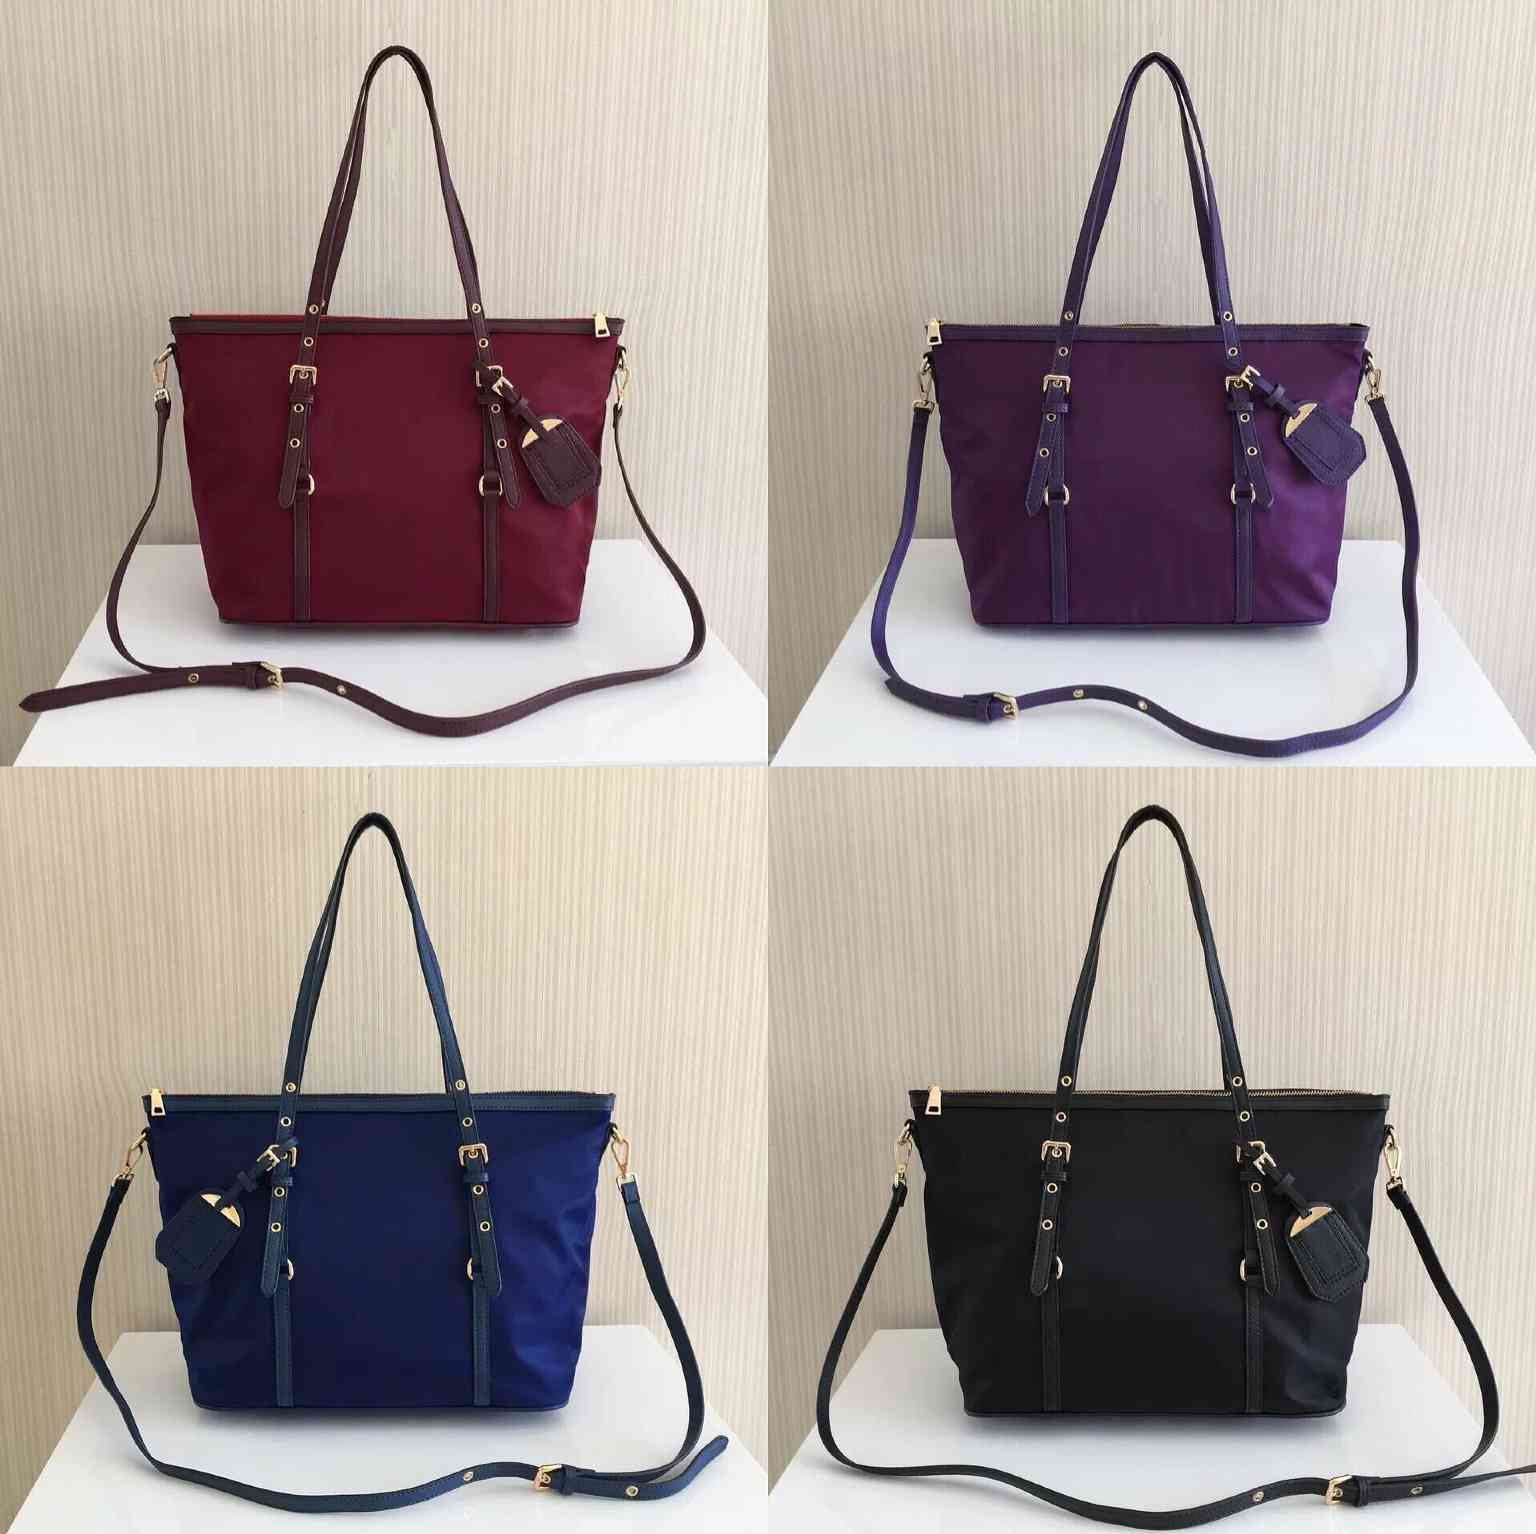 Wholesale Classic Ladies Handbag Shoulder Bag Parachute Nylon Shopping Bag Waterproof Oxford Cloth Large Capacity Handbag Shoulder Bag Messe